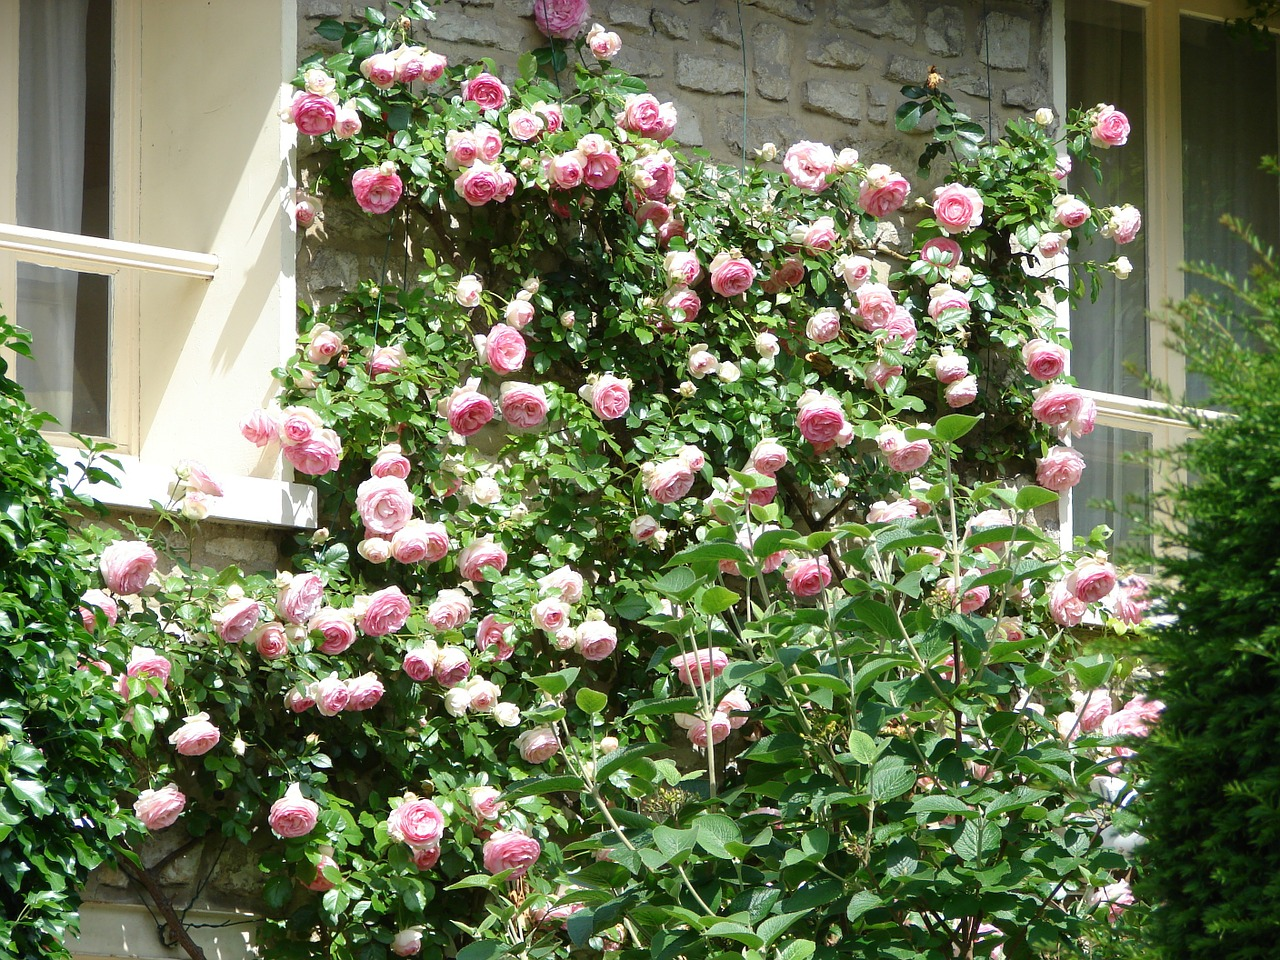 bien etre, bio, gazette, gazette bio, hiver, jardin, jardinage, nature, printemps, rose, rosier, rosier arbustif, rosier grimpant, rosier grimpant taille, rosier liane, rosier liane persistant, rosier liane remontant, rosier liane taille, rosier taille, rosier taille après floraison, rosier taille de printemps, rosier taille ete, rosier taille fleurs fanées, rosier taille floraison, rosier taille juillet, rosier taille periode, rosier taille severe, rosier tailler trop court, rosier valentin, santé